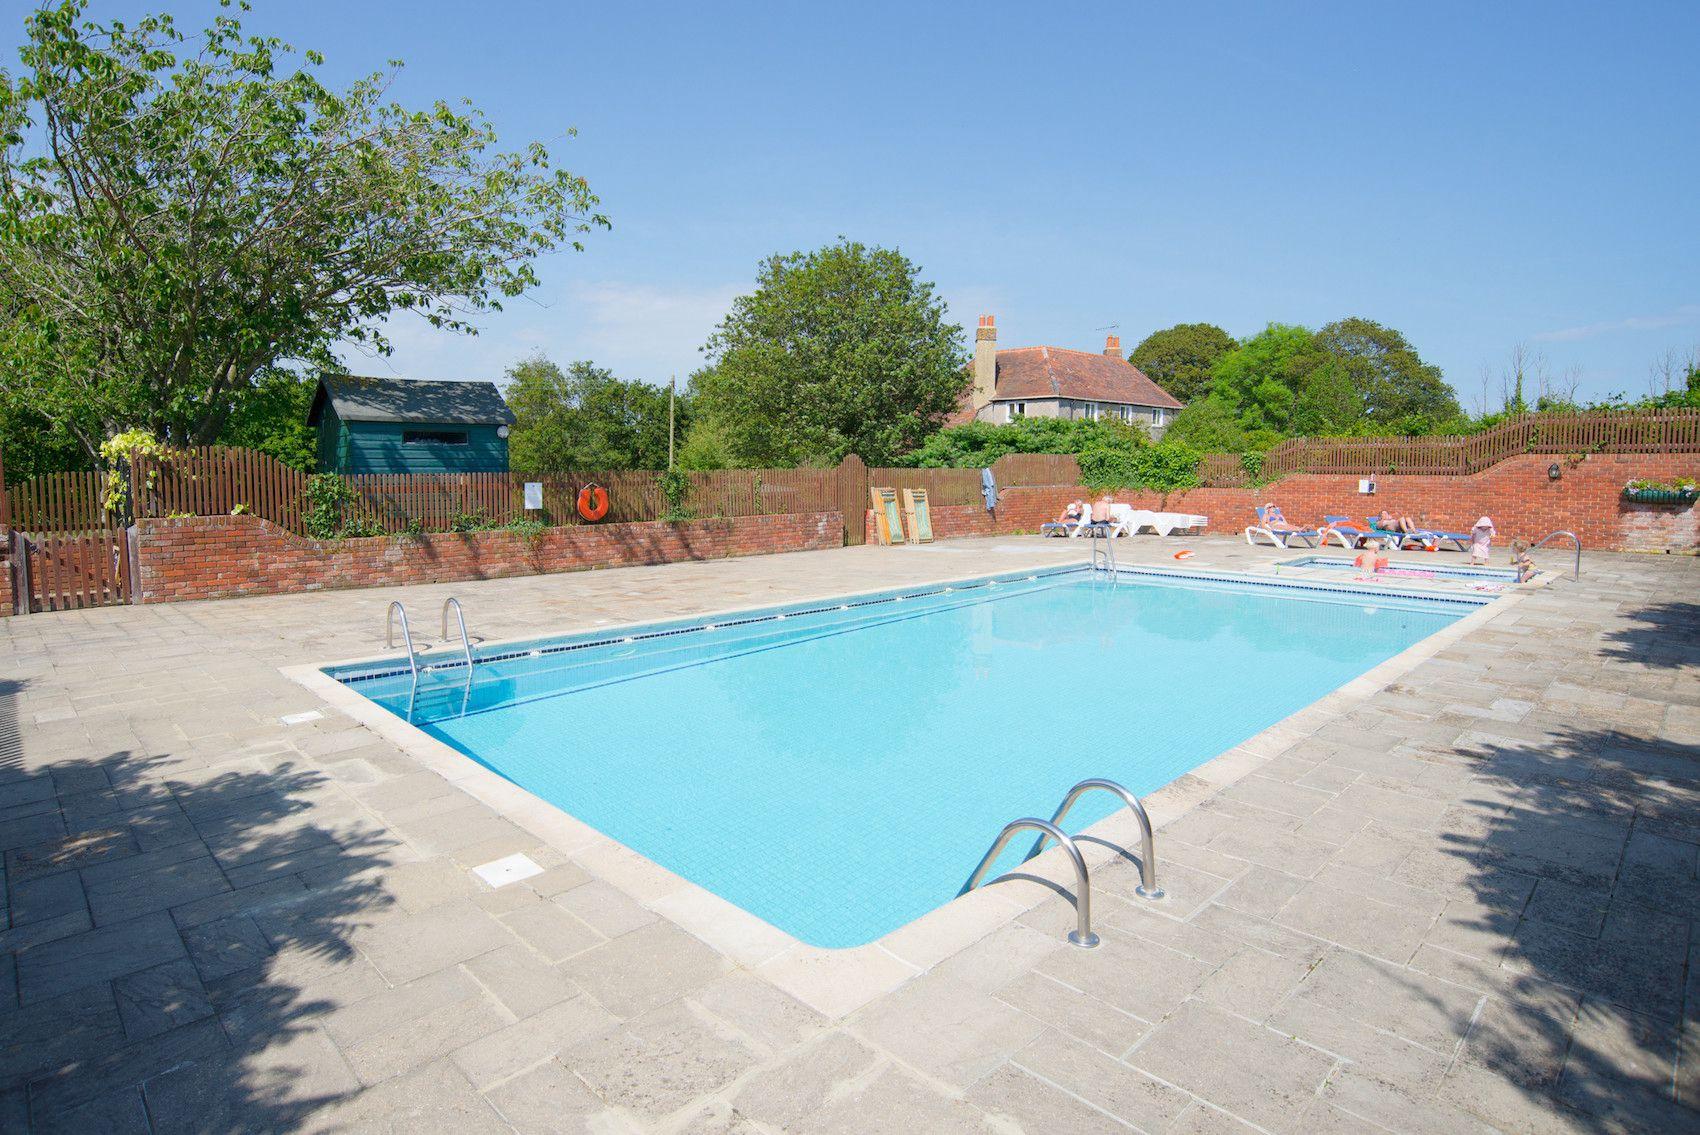 Campsites With Swimming Pools Uk